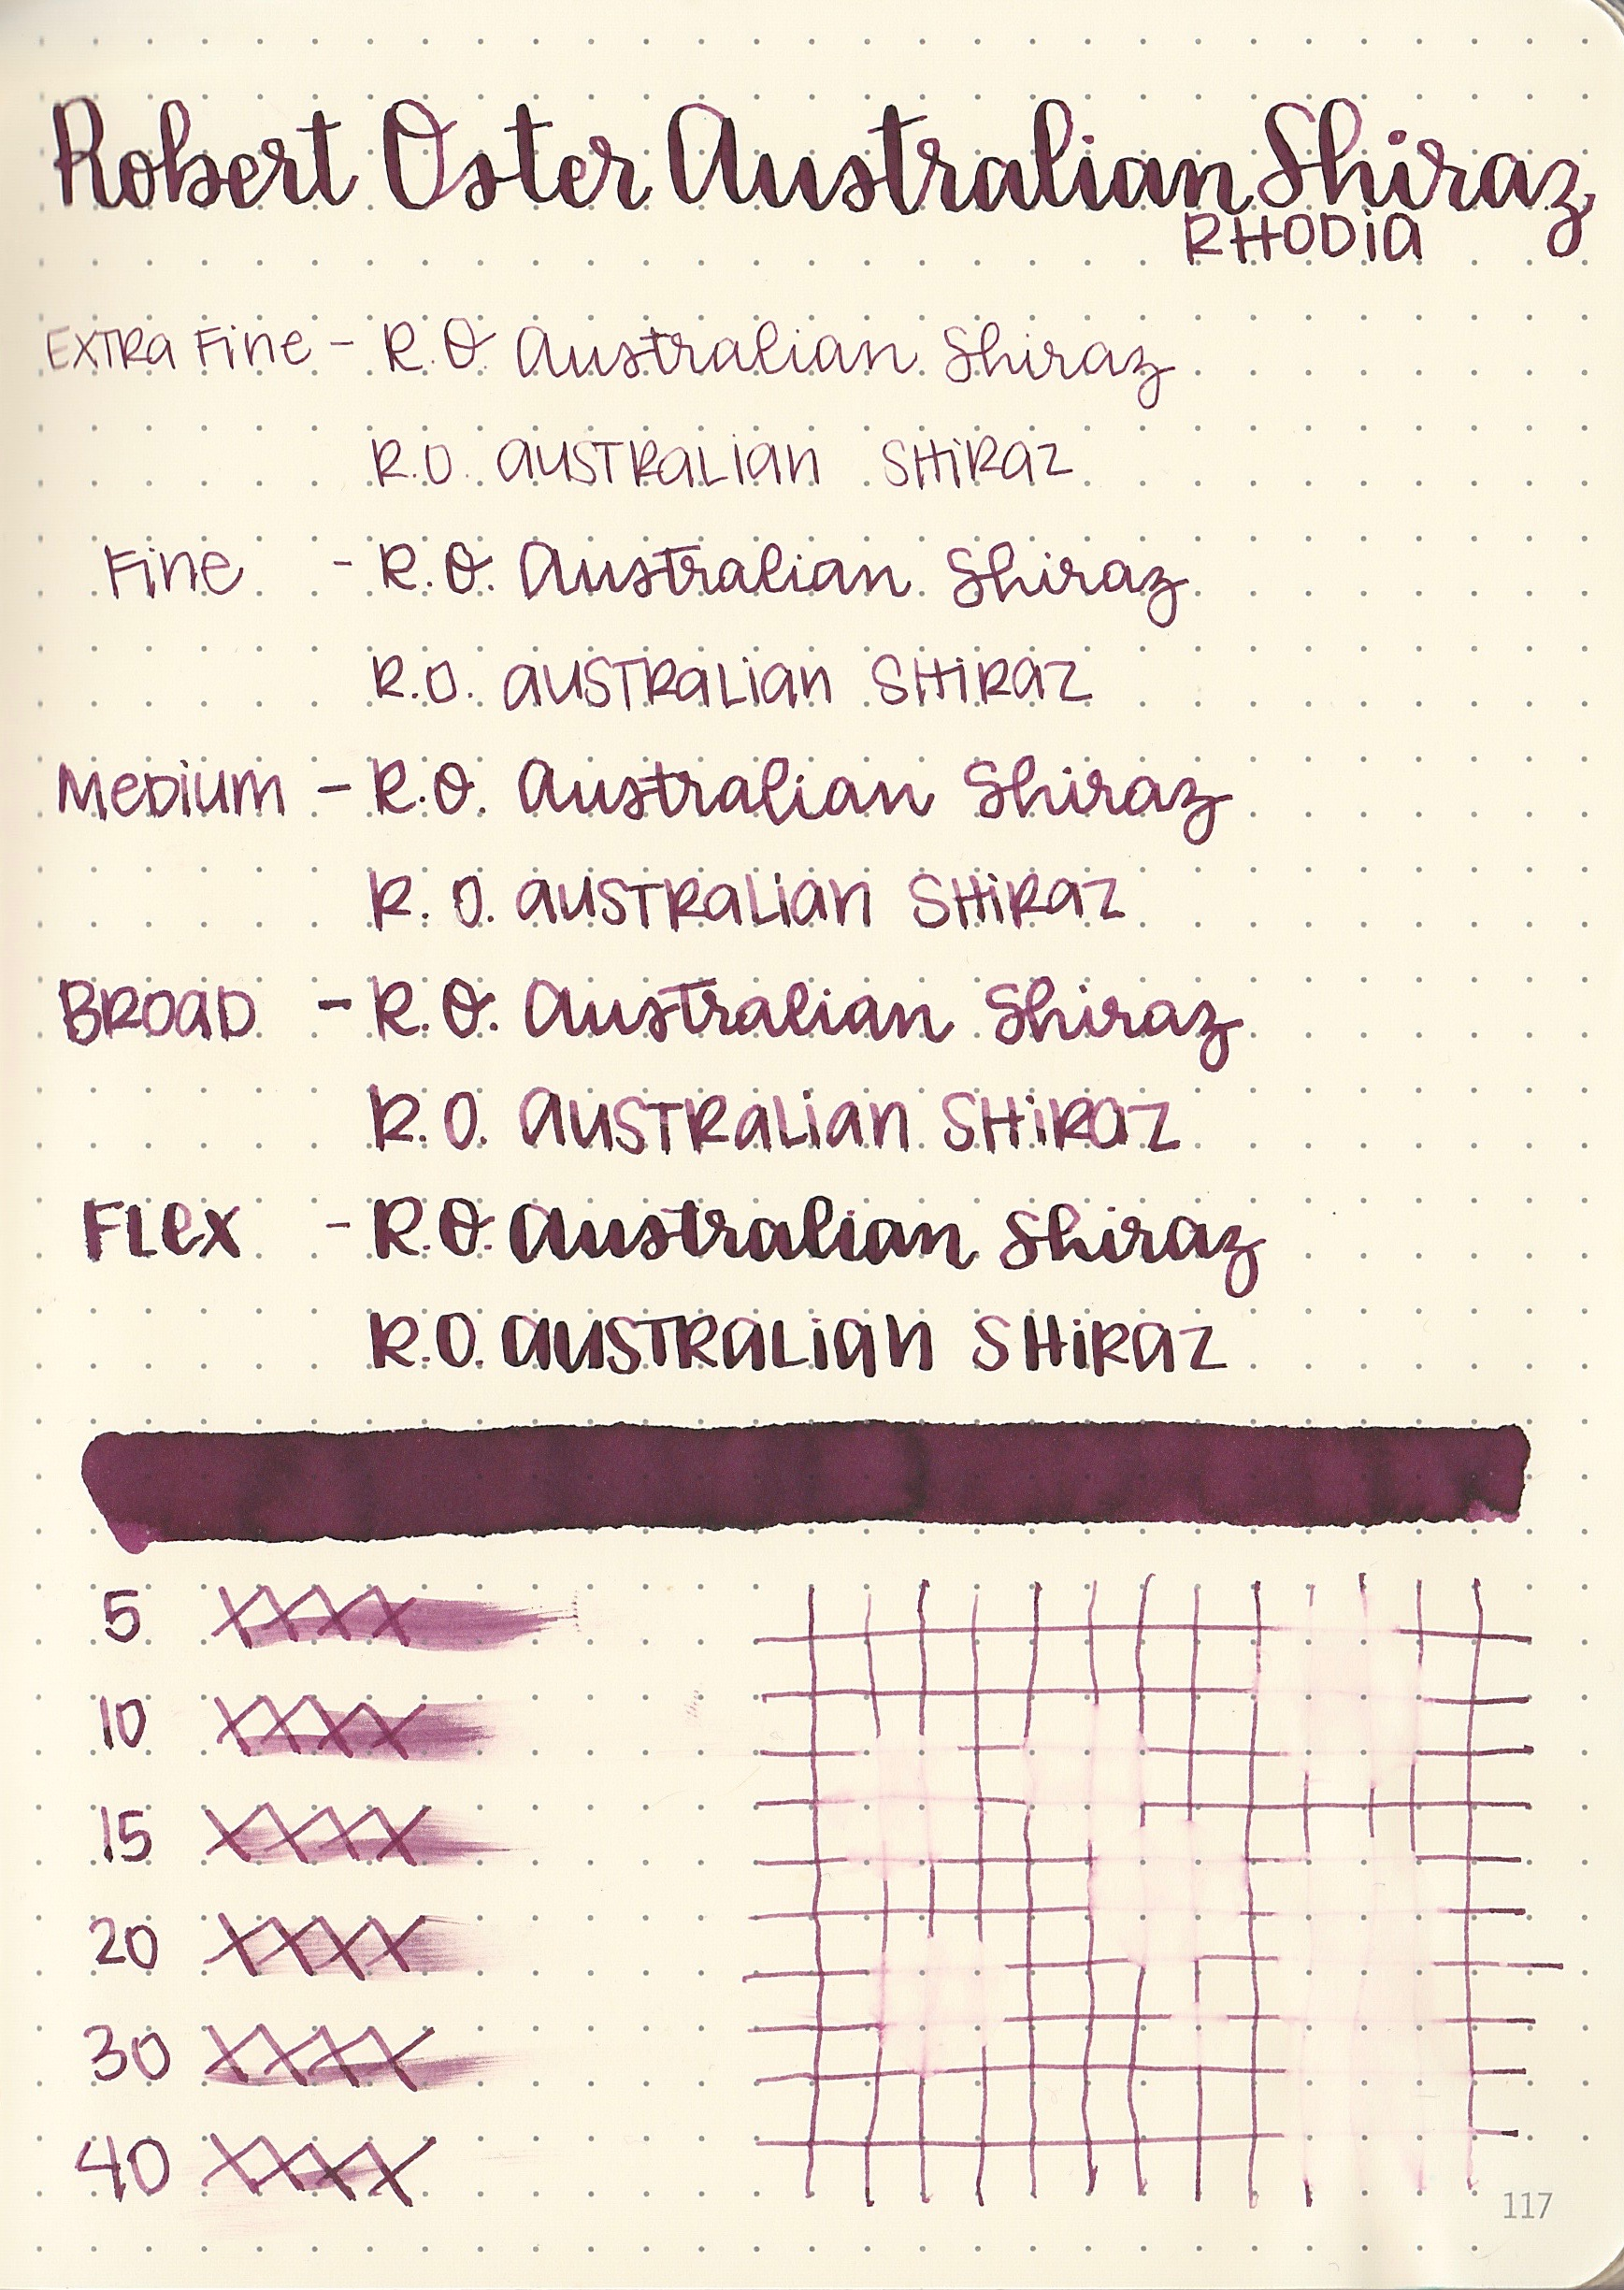 ROAustralianShiraz - 2.jpg